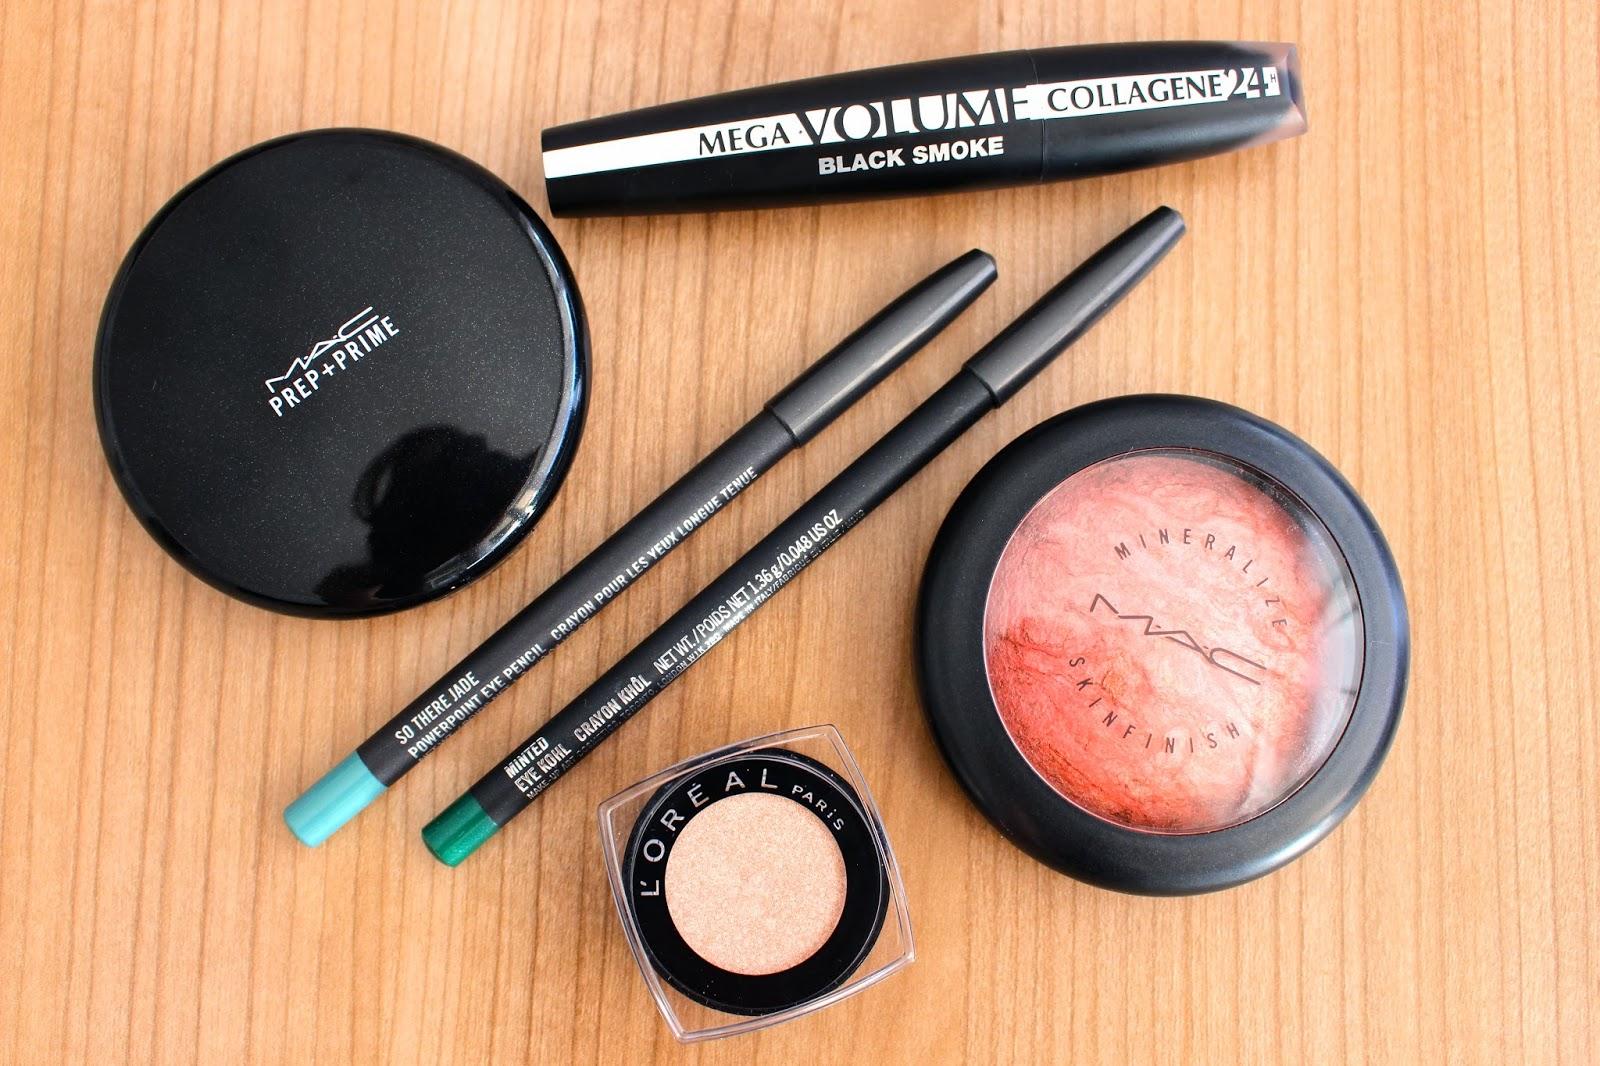 makeup-haul-mac-cosmetics-loreal-1